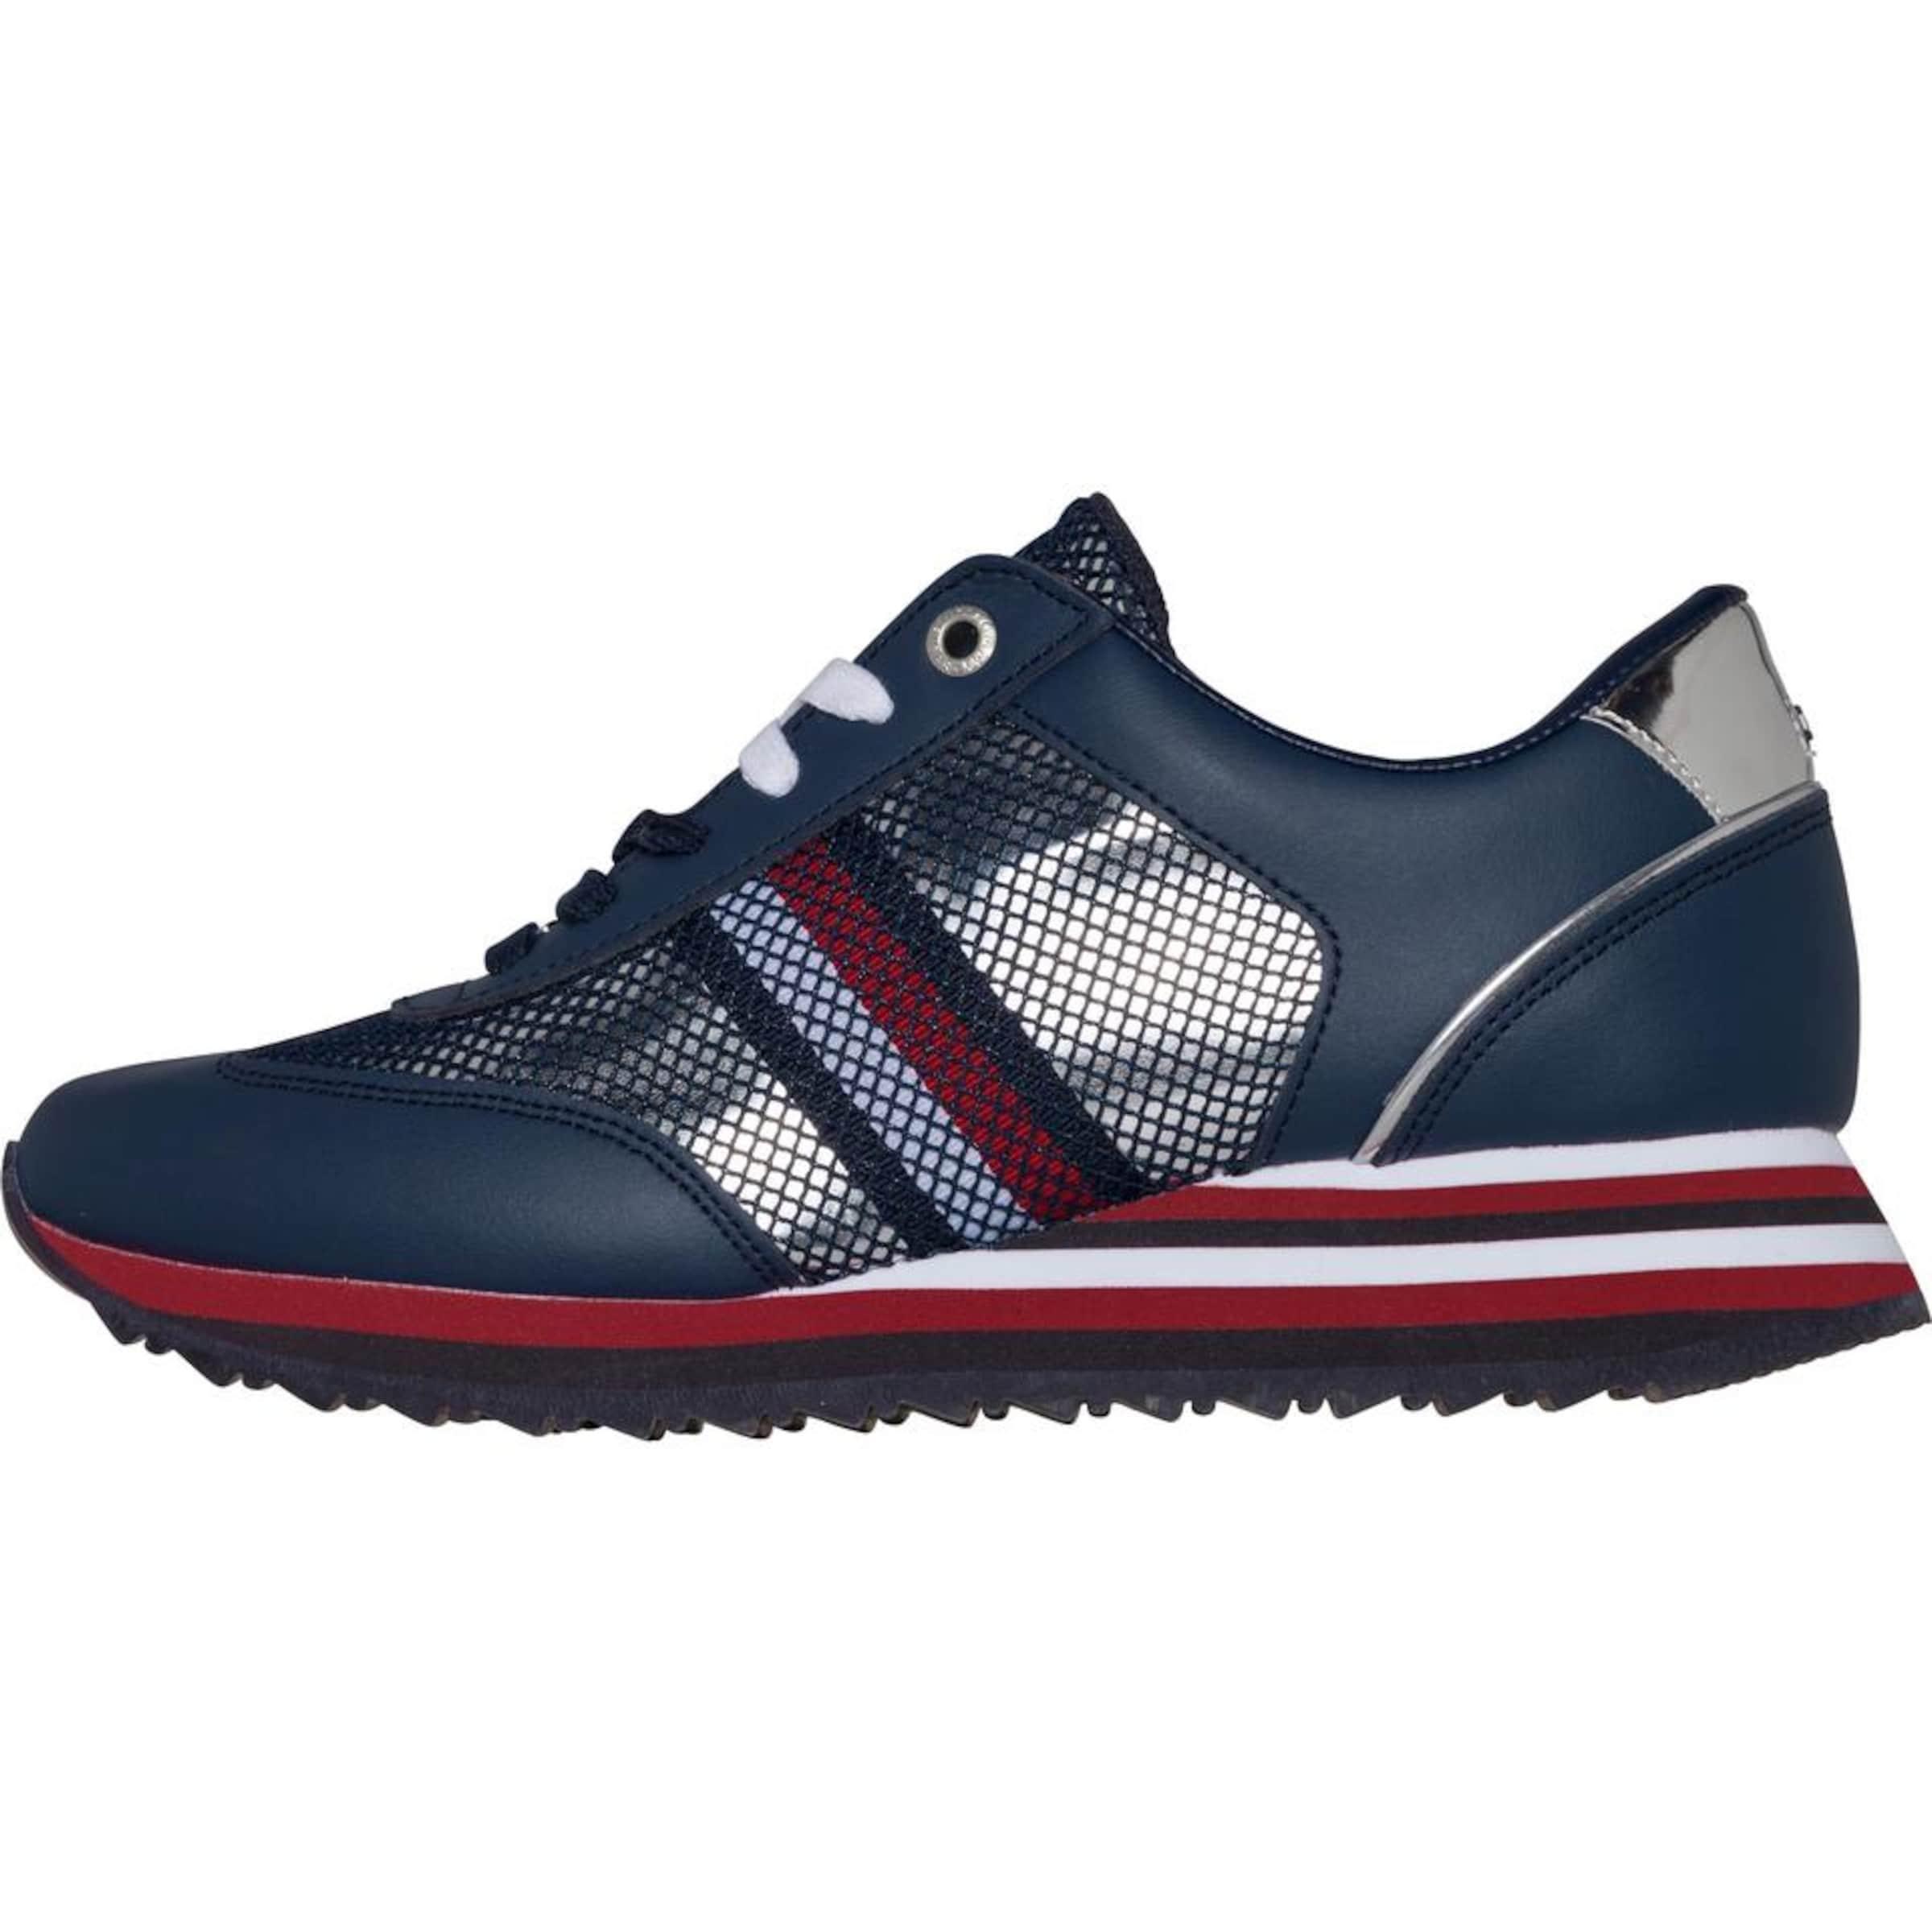 Haltbare Mode billige Schuhe TOMMY HILFIGER Sneaker   Sneaker HILFIGER Schuhe Gut getragene Schuhe ecd259